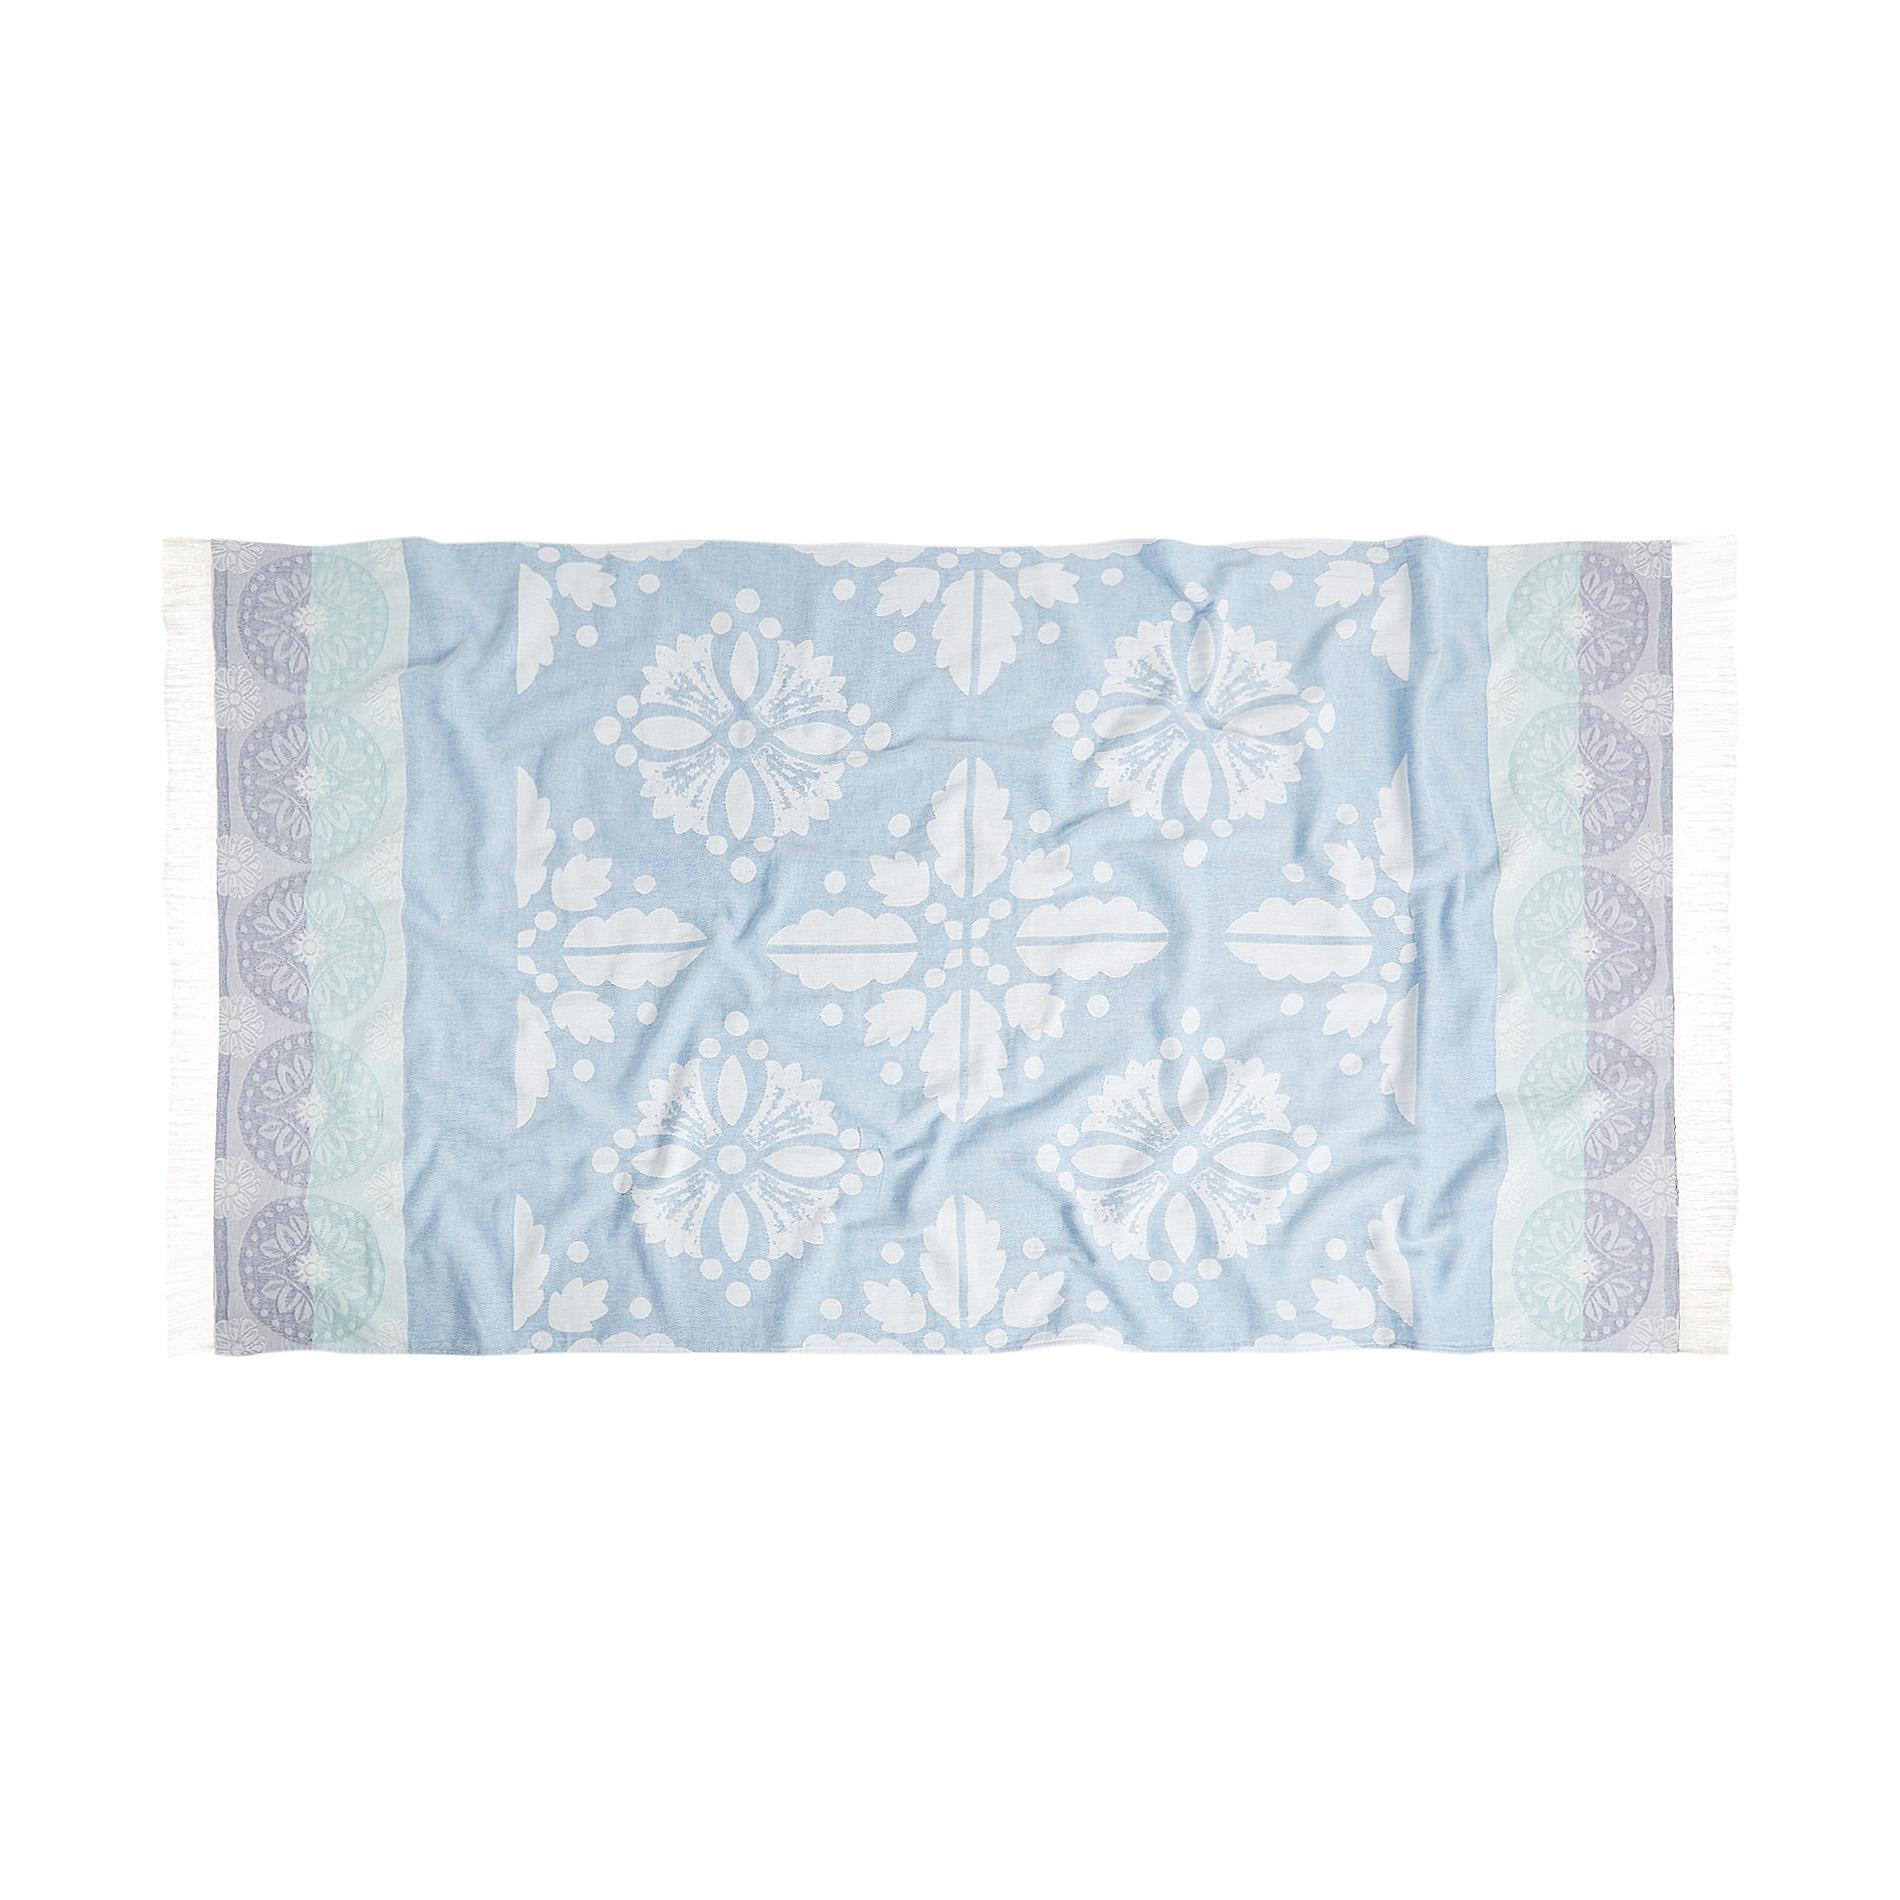 Hammam Style: 100% Cotton Hammam-style Majolica Beach Towel